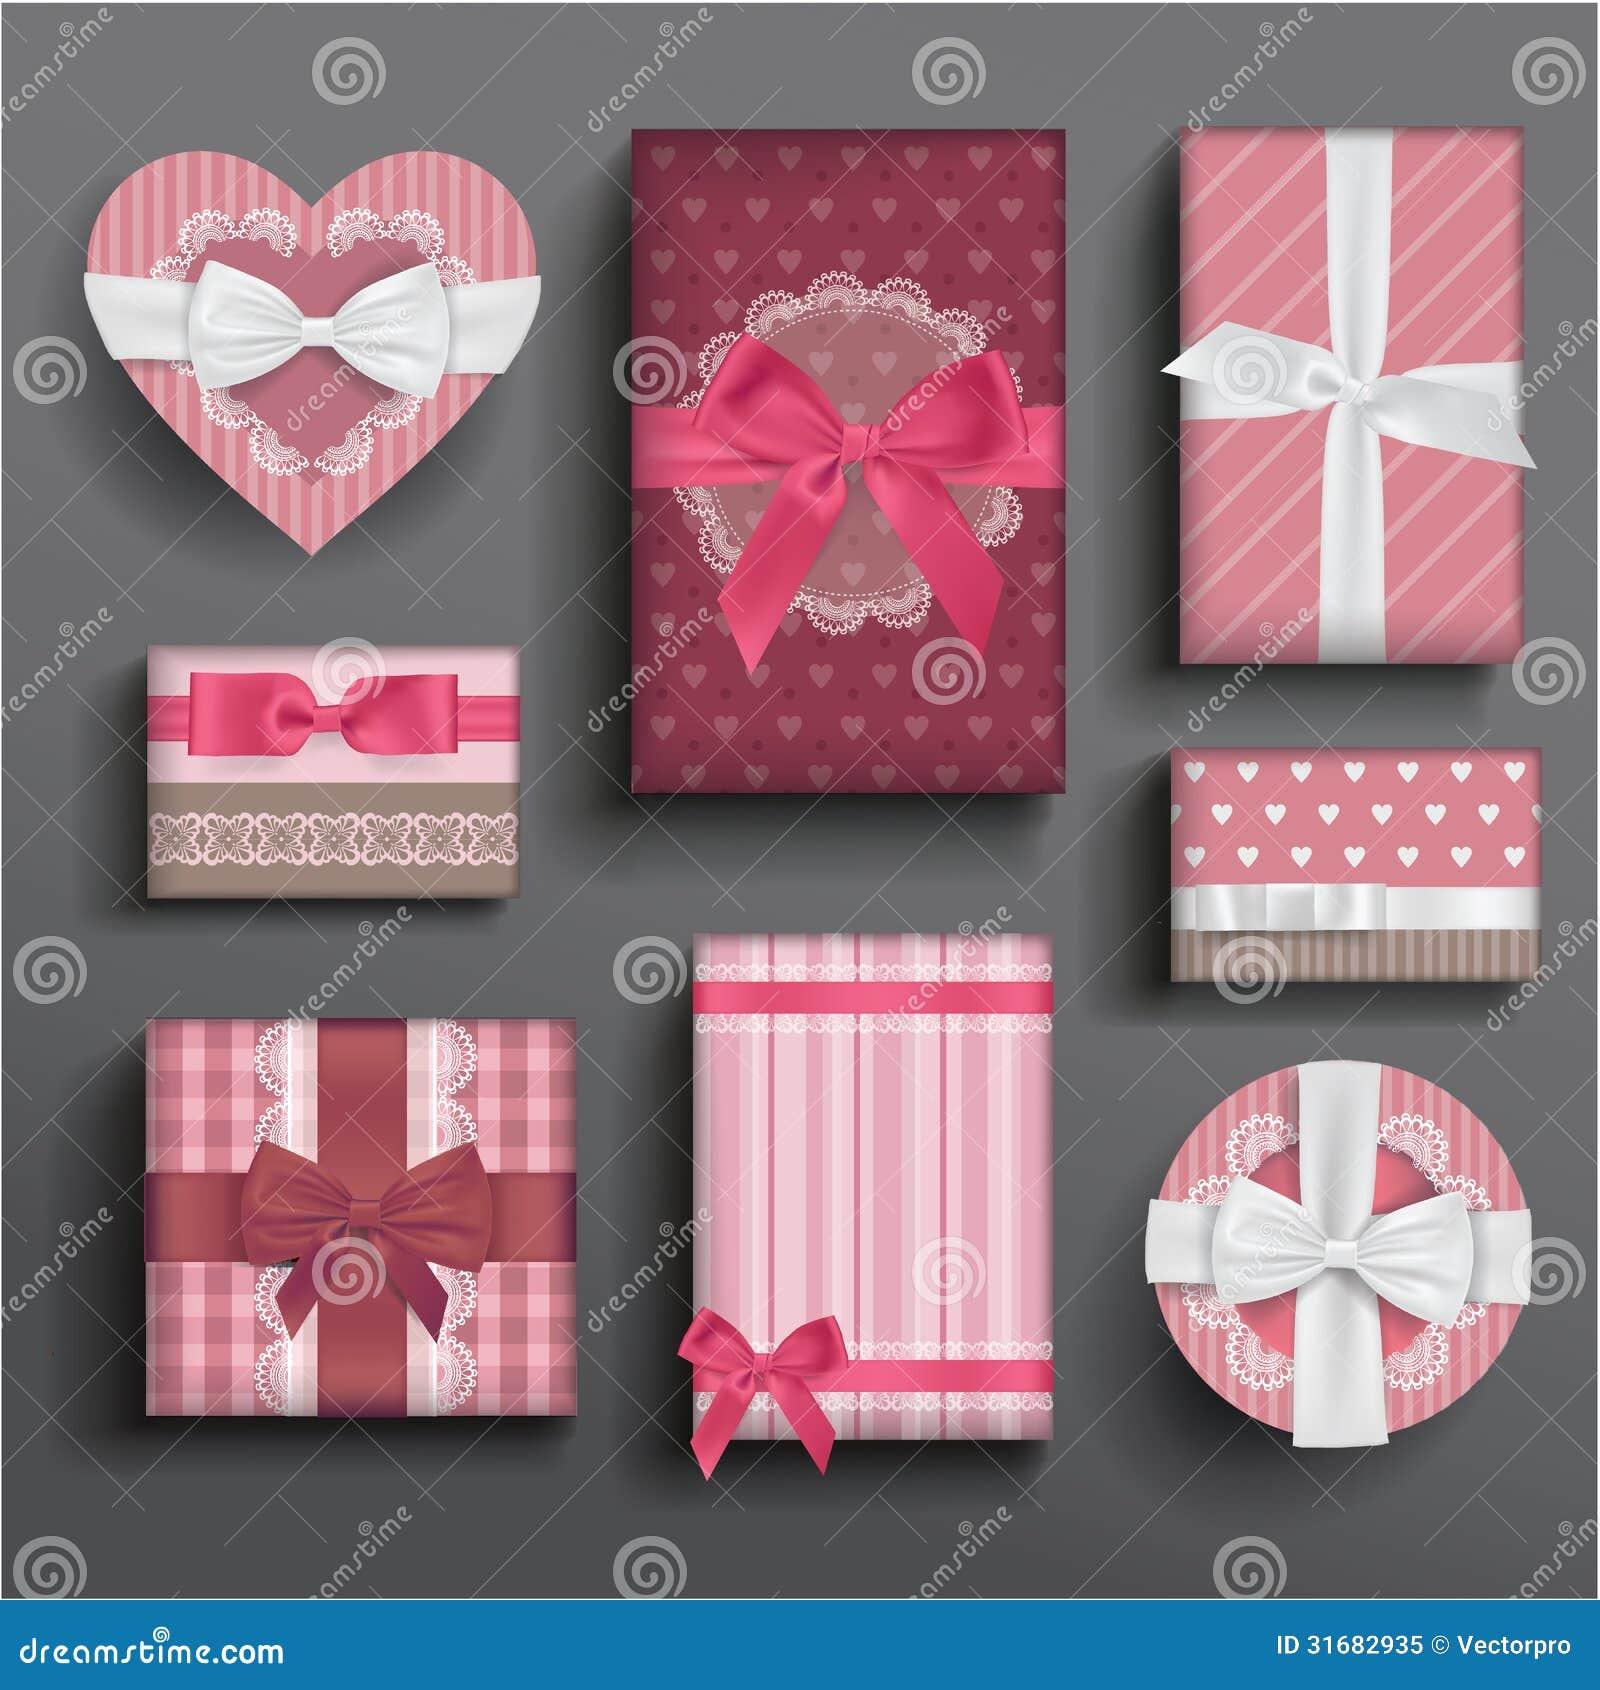 girly boxes and bows stock illustration  image of ribbon